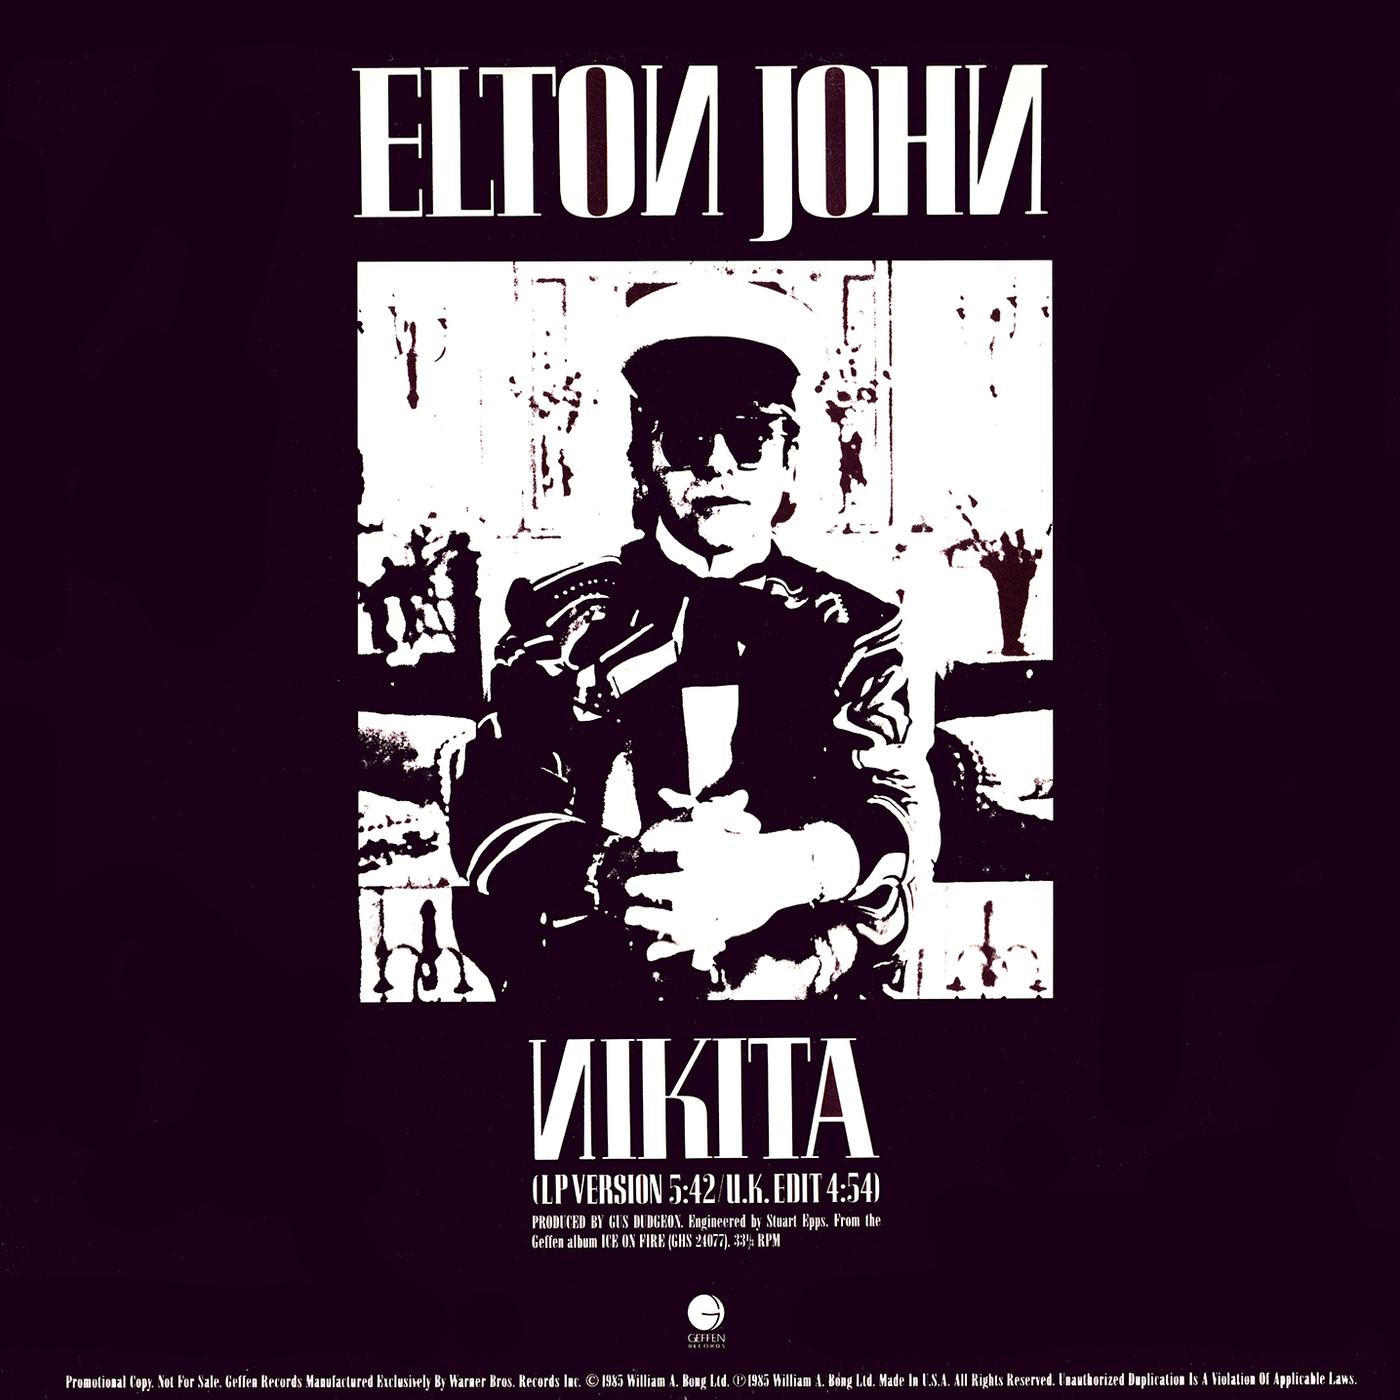 Elton John Nikita U K Edit Us 12 Promo 1985 In